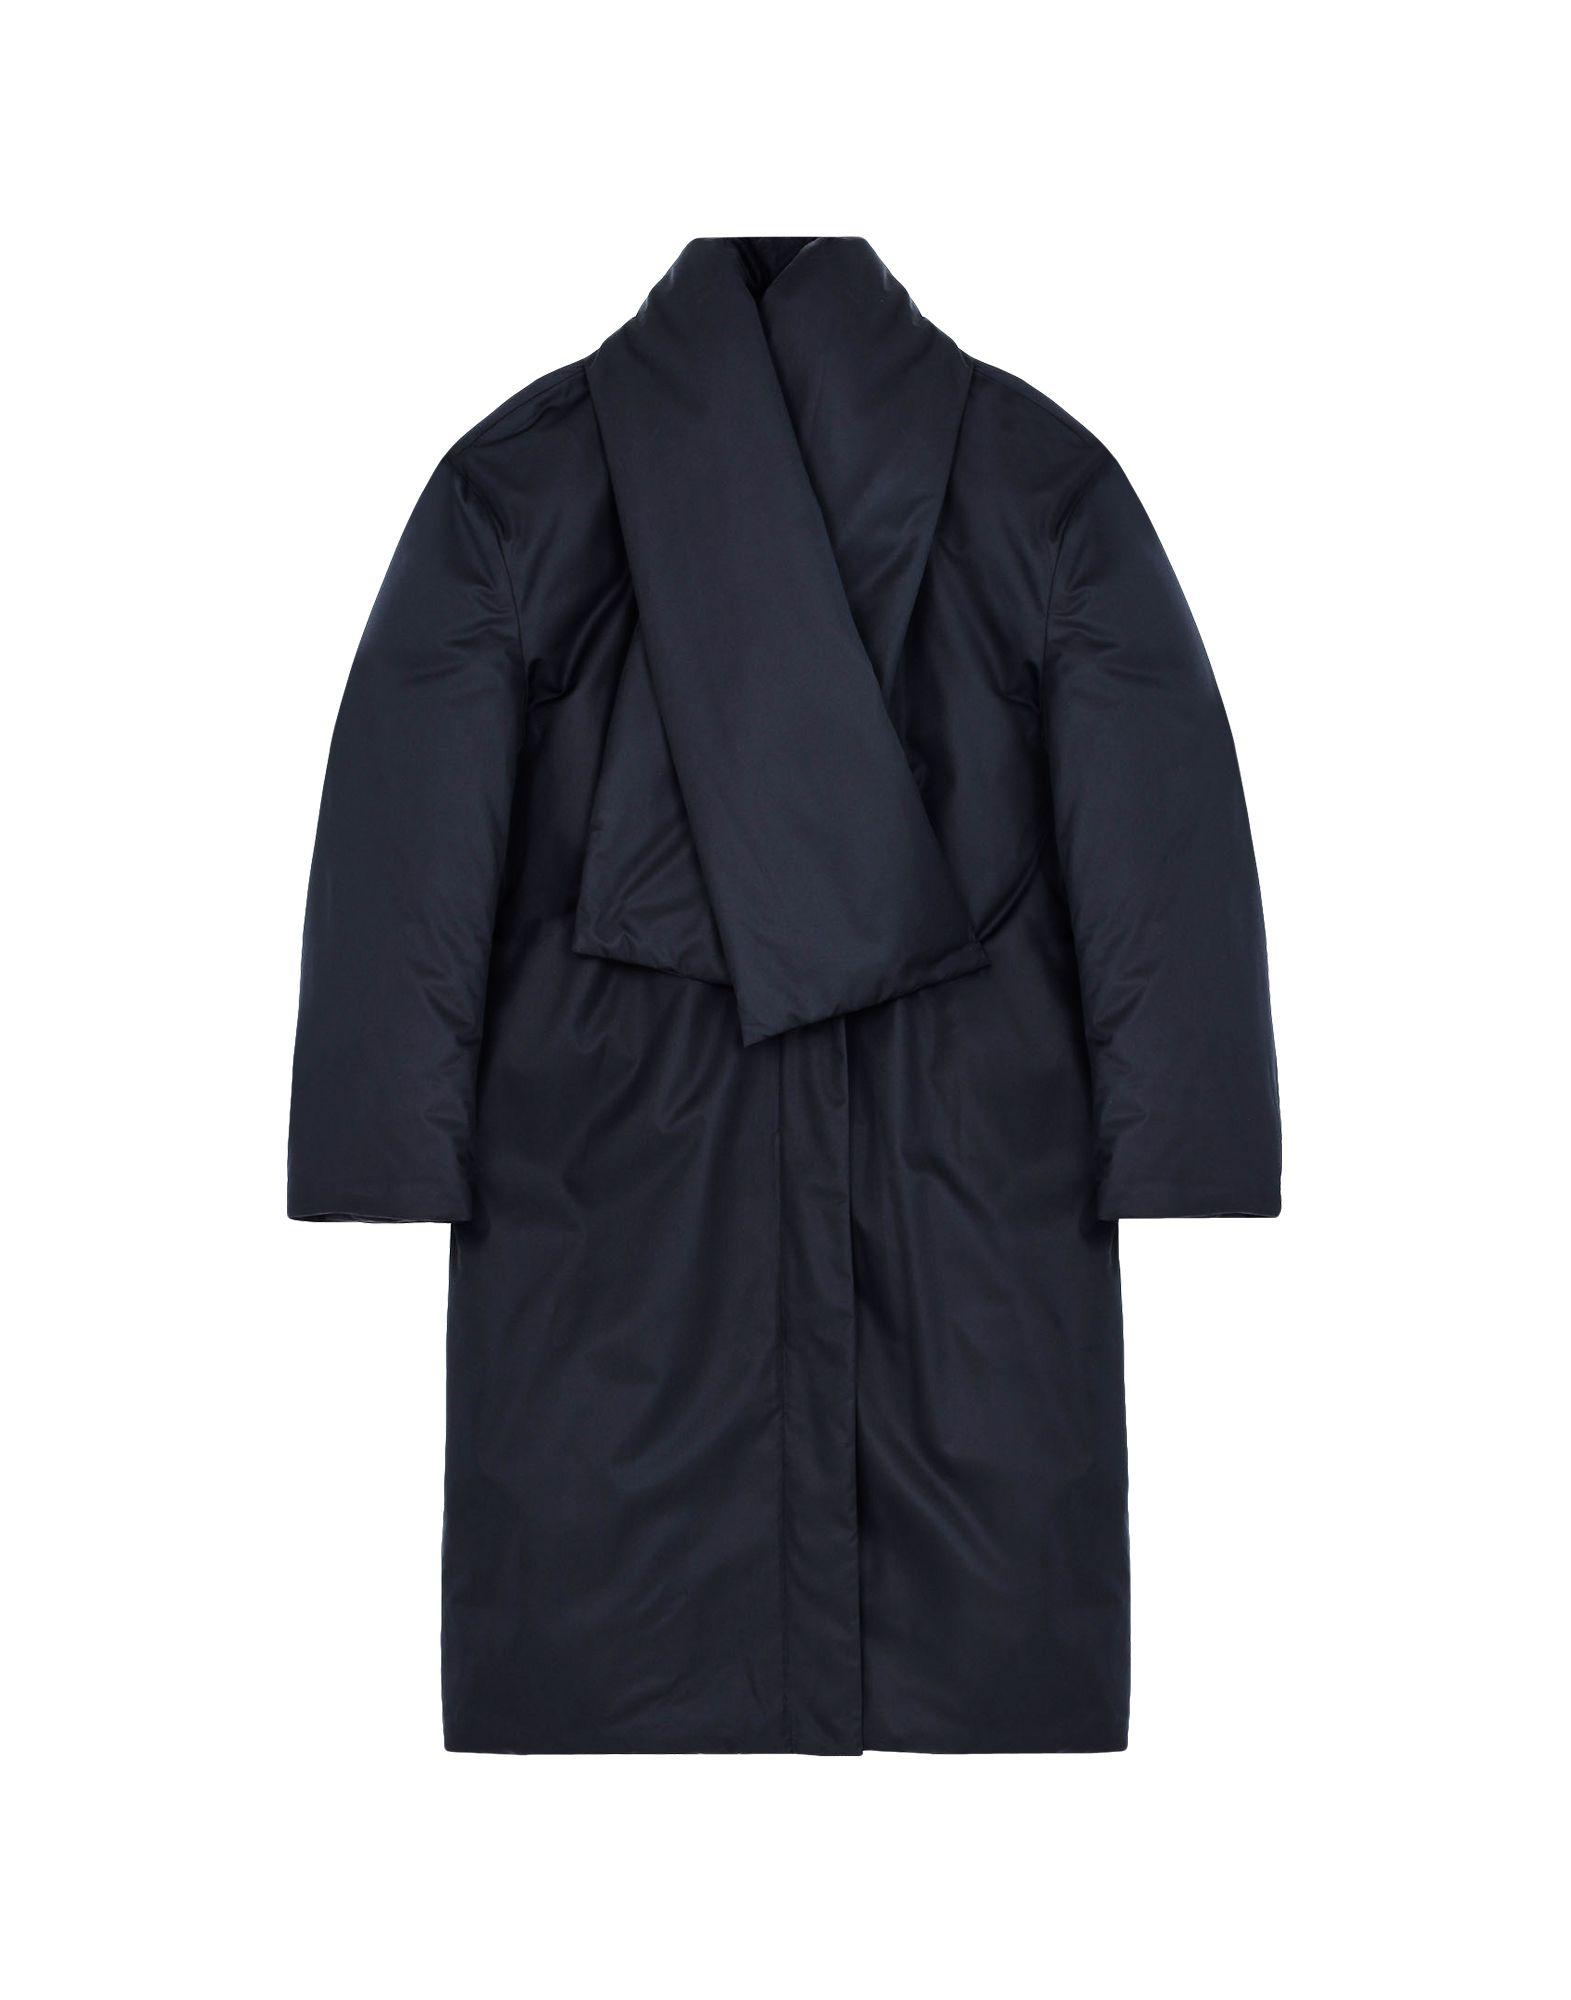 Down jacket - JIL SANDER Online Store